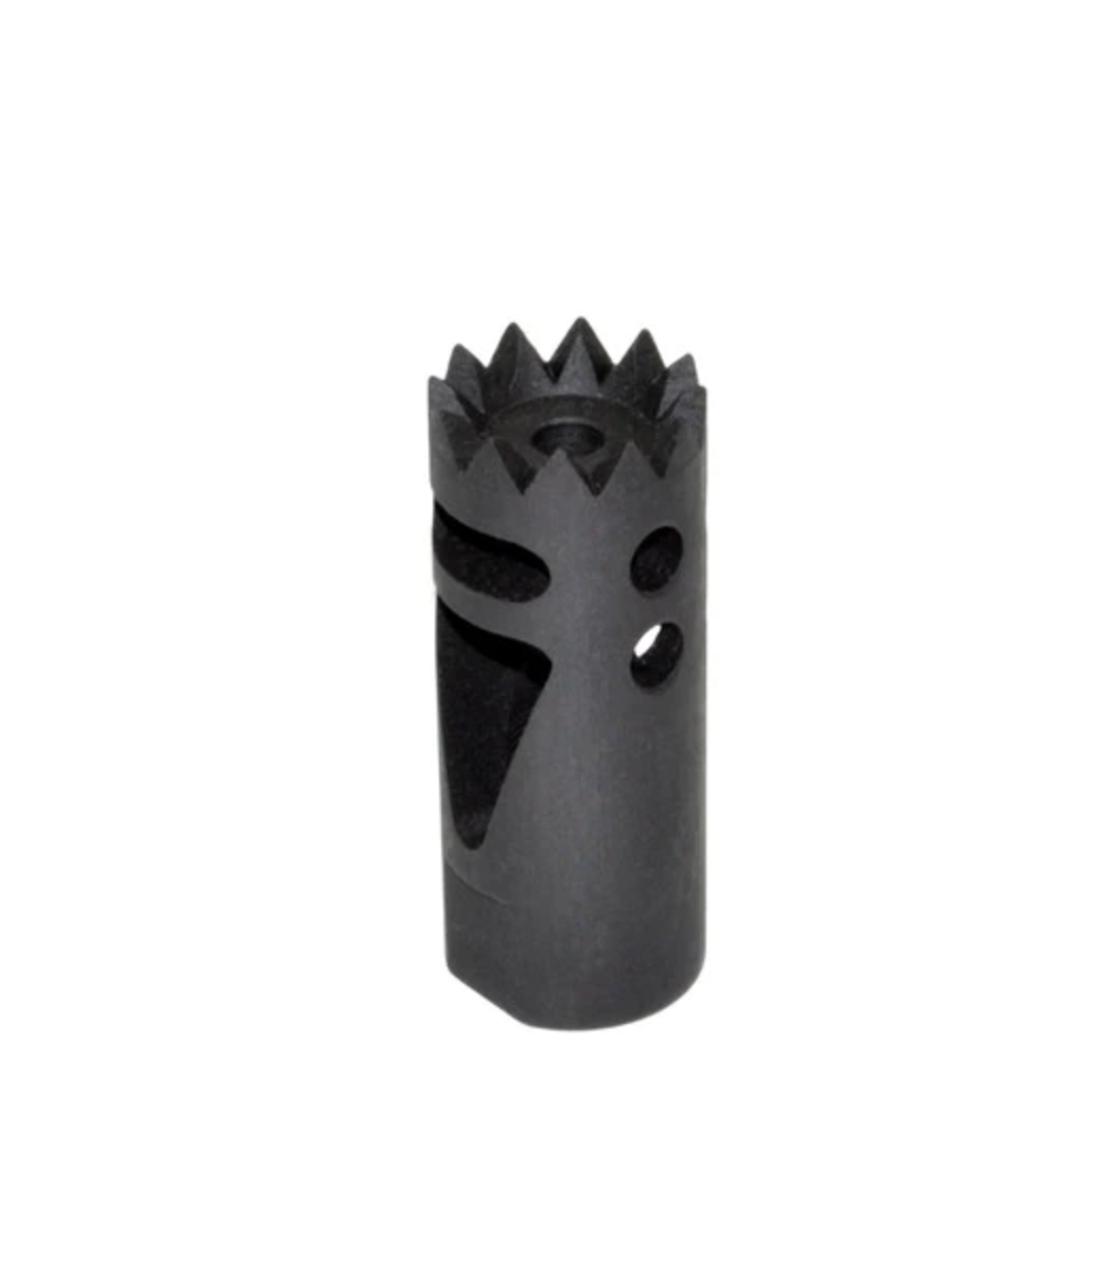 "Steel Competition Grade Muzzle Brake Recoil Compensator for AR-15 .223, 1/2""x28 thread, Gunmetal Black"